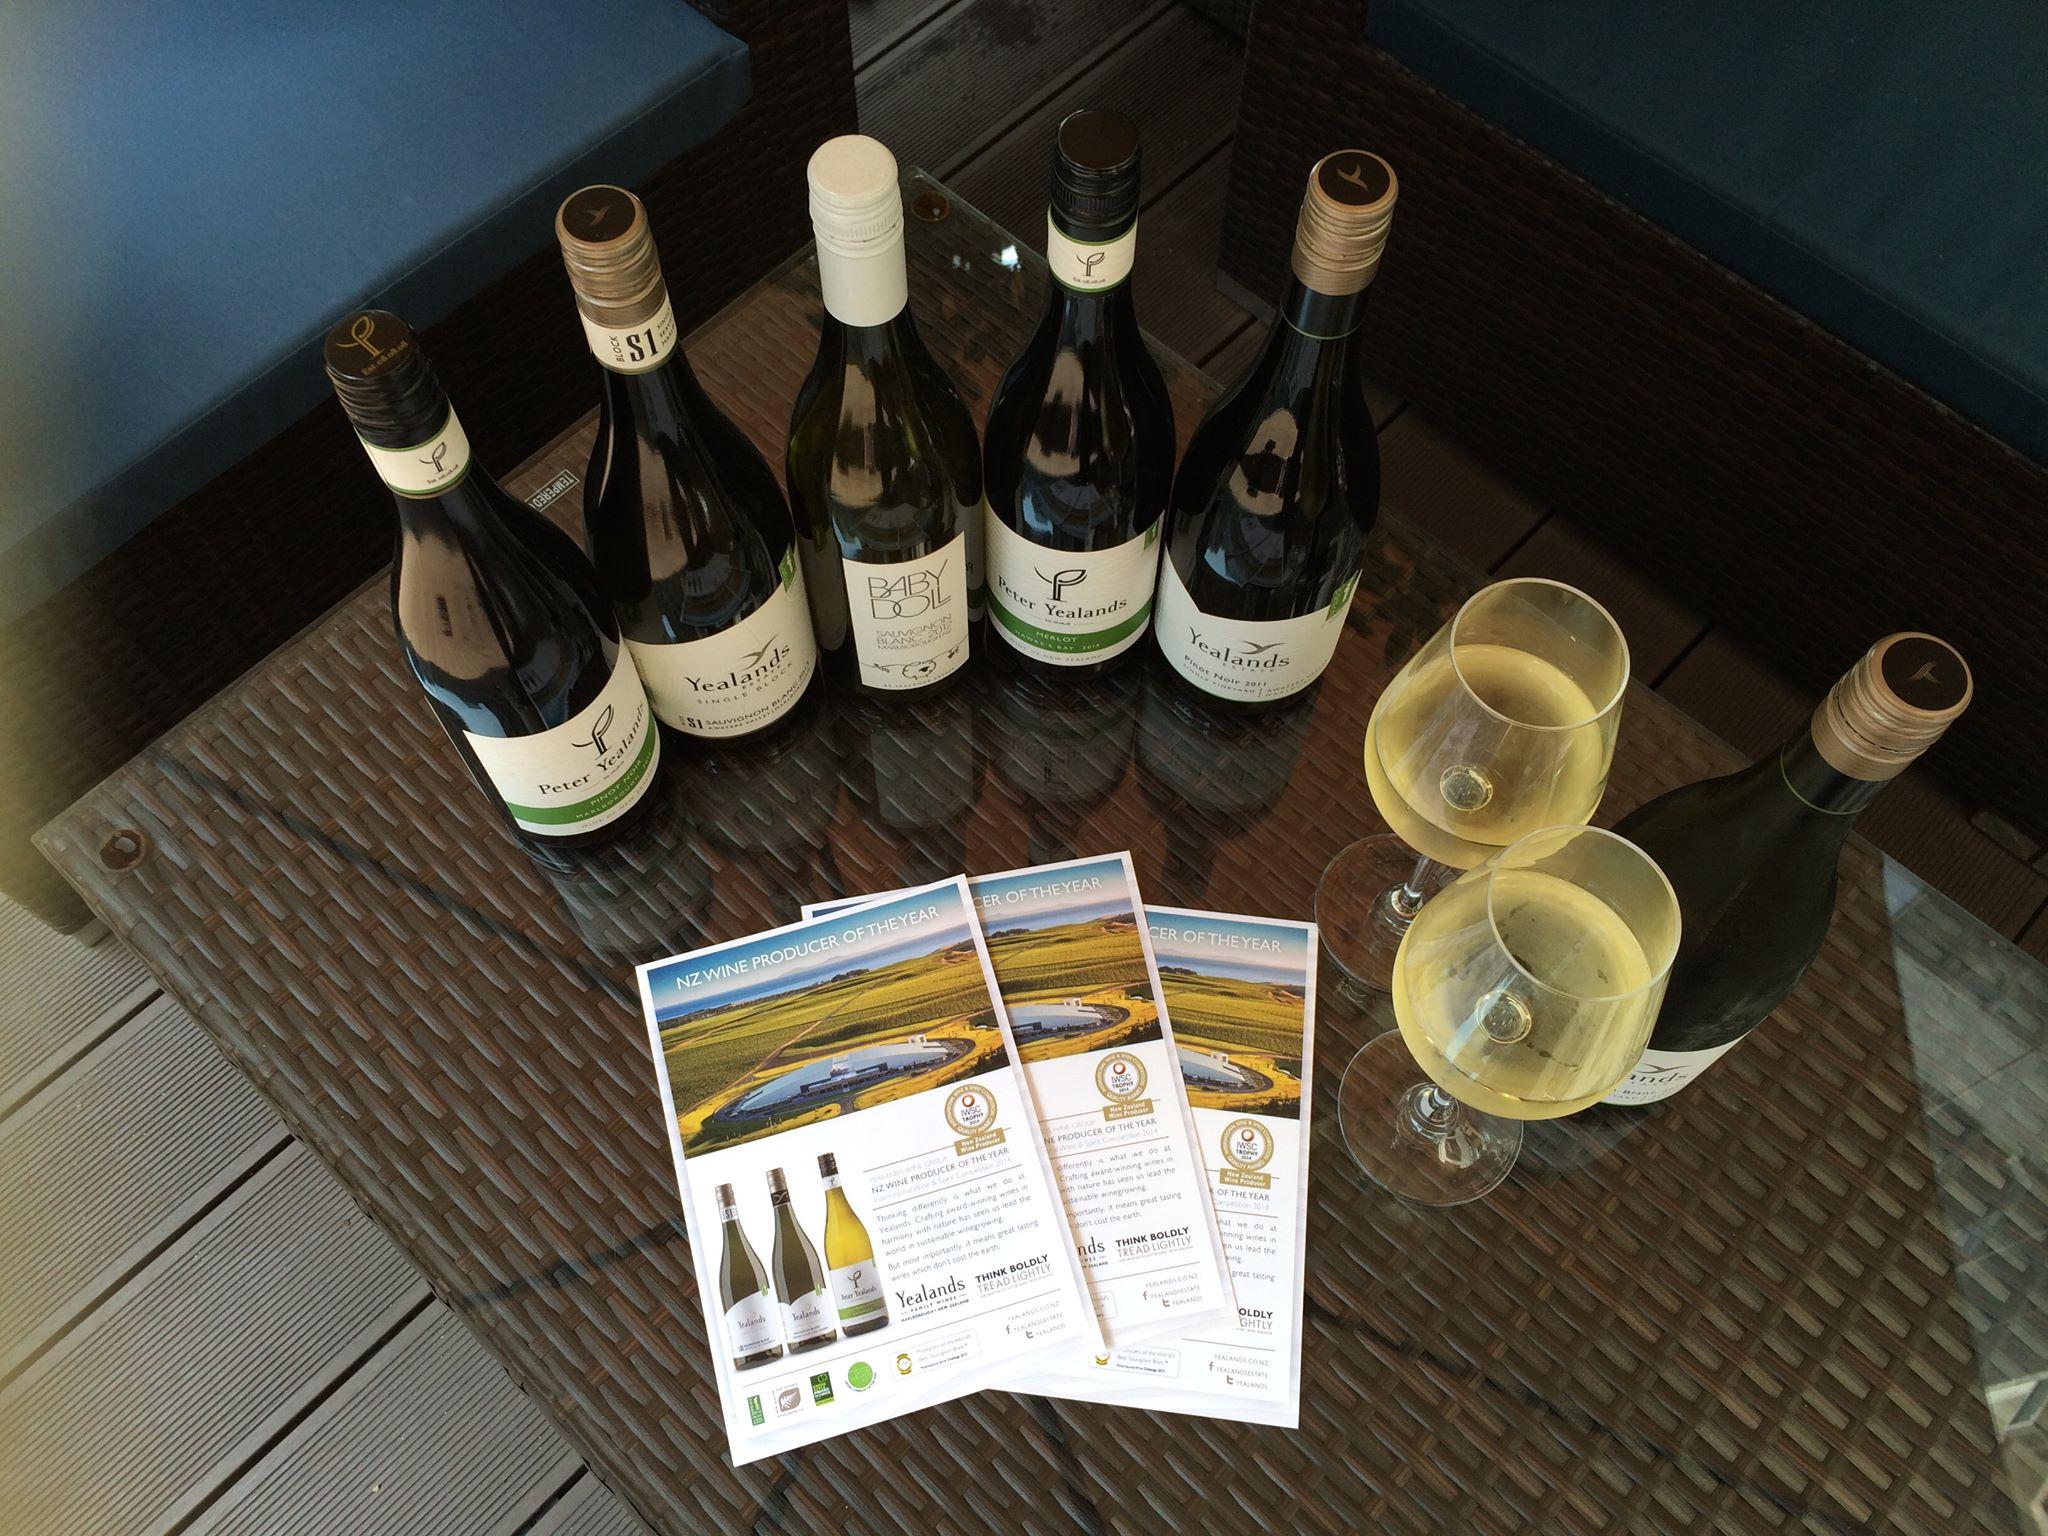 Peter Yealands/Yealands Estate Award Winning Wines